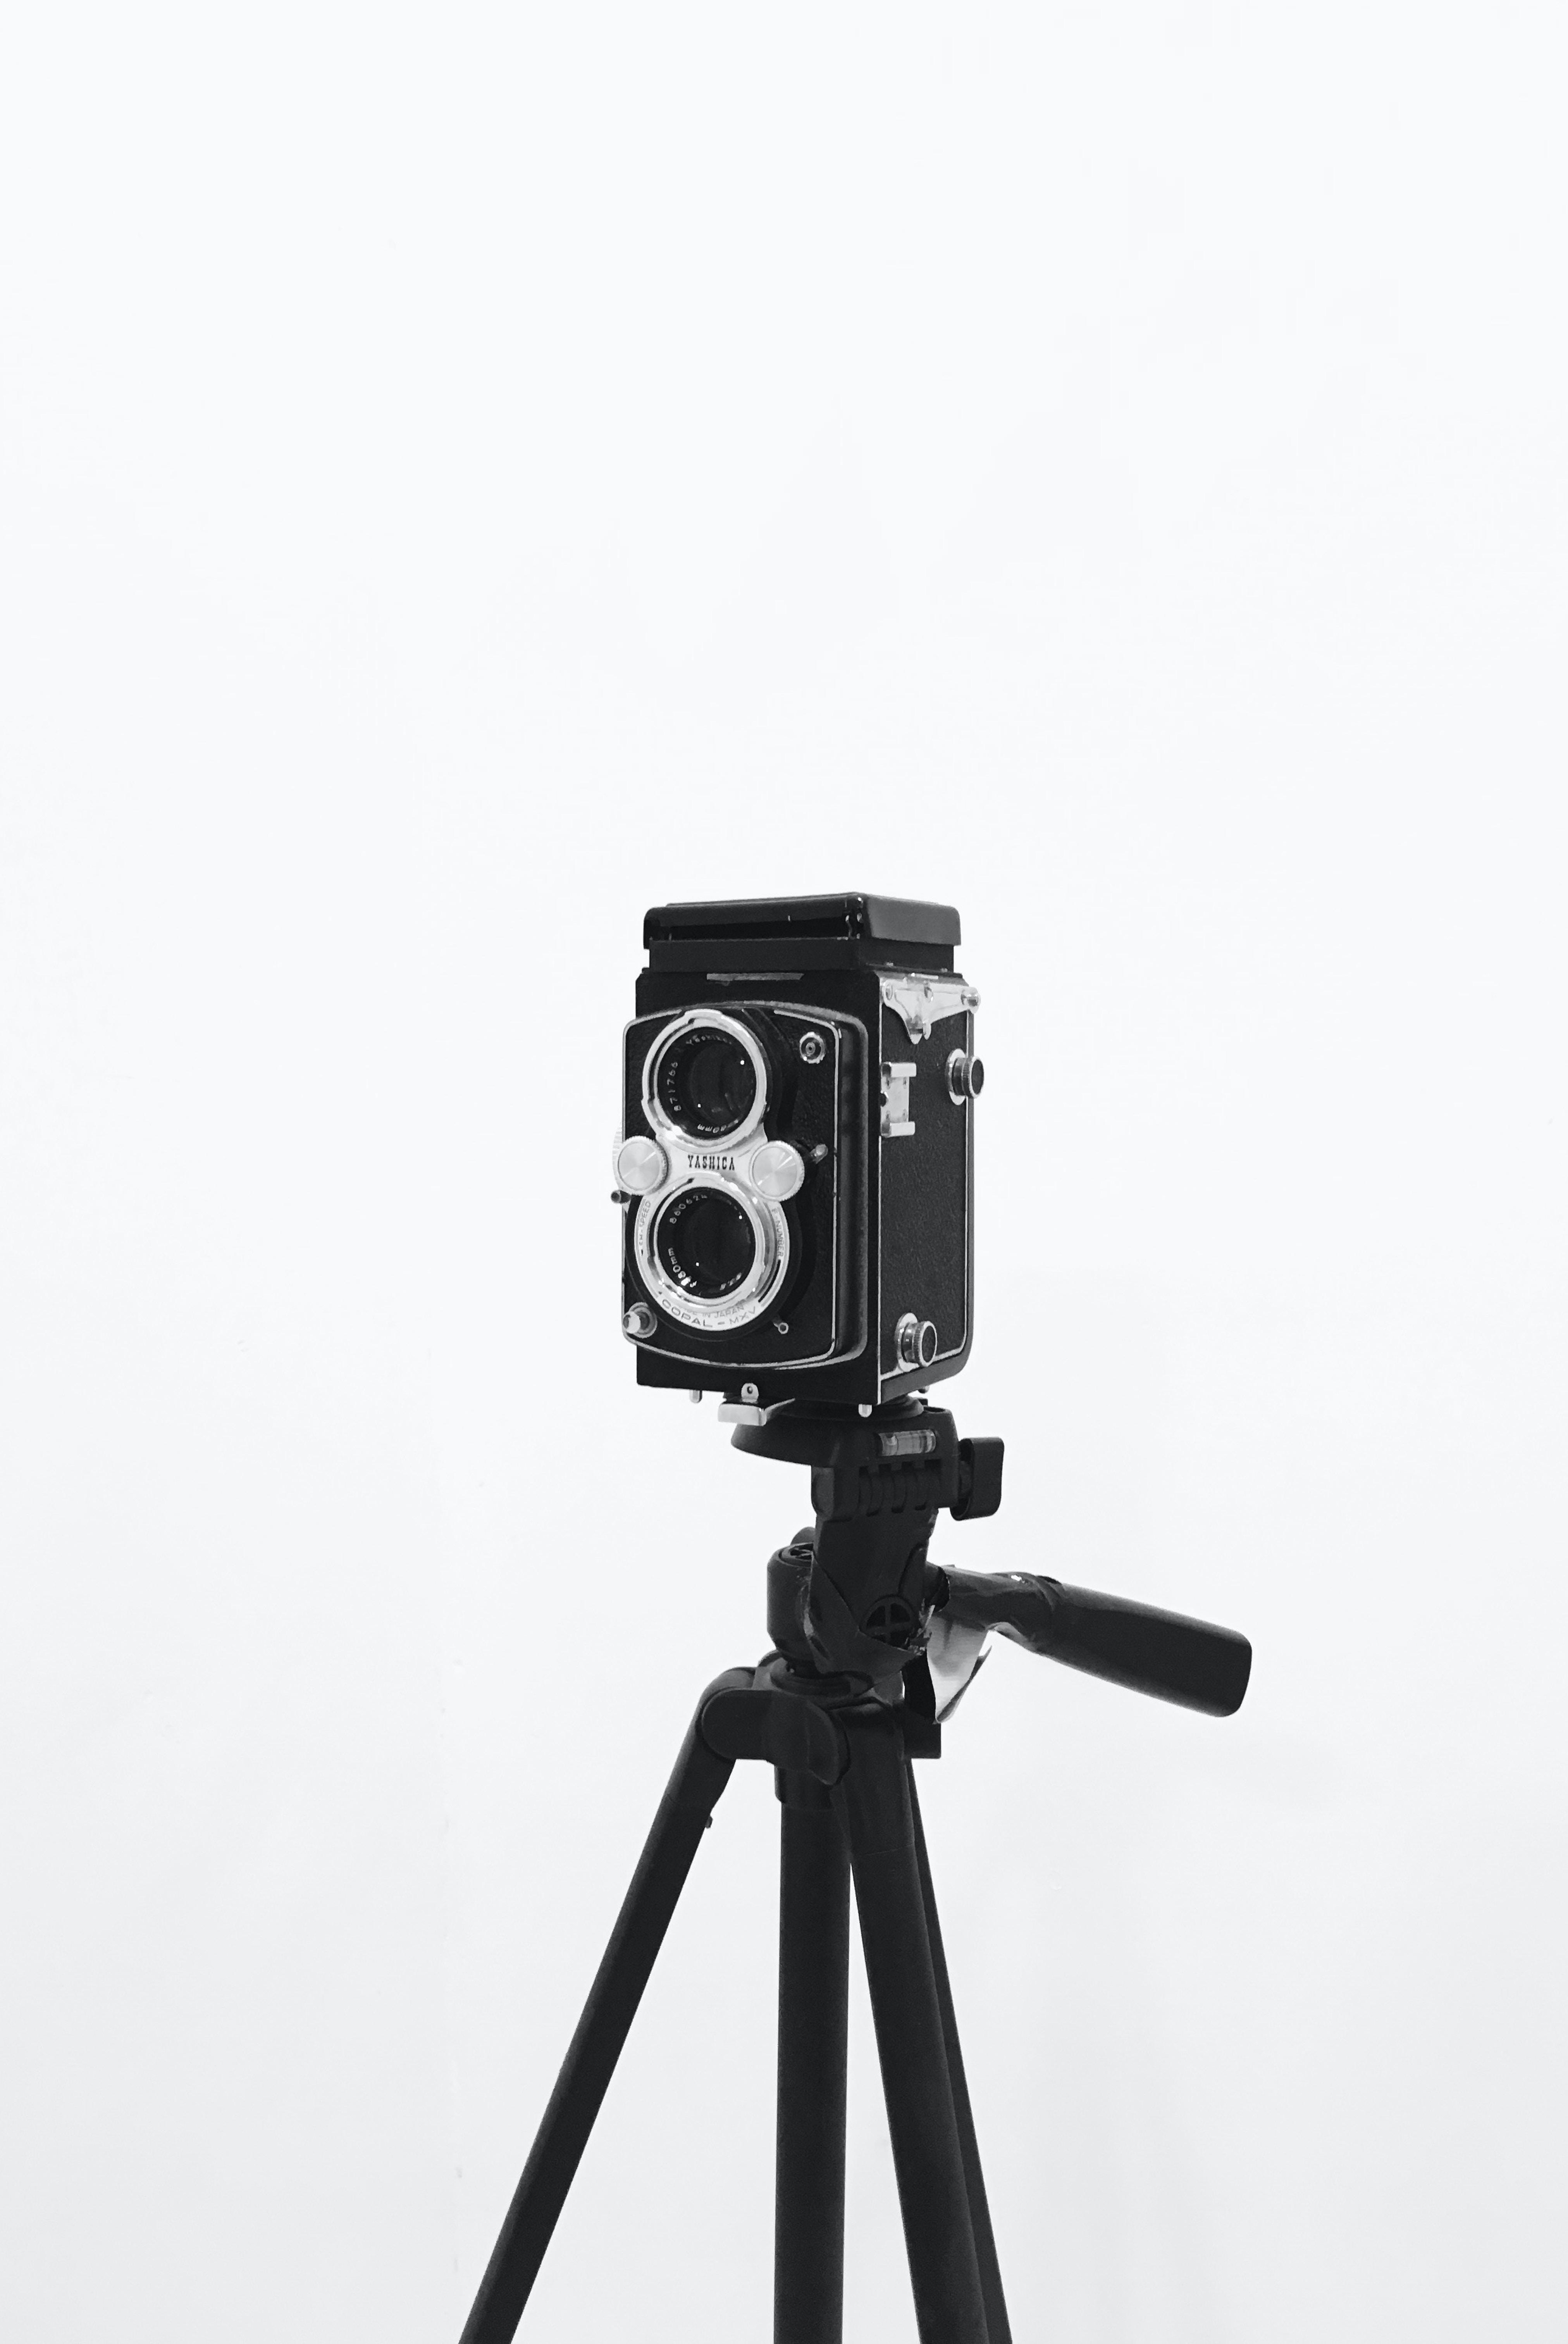 black and silver land camera on tripod